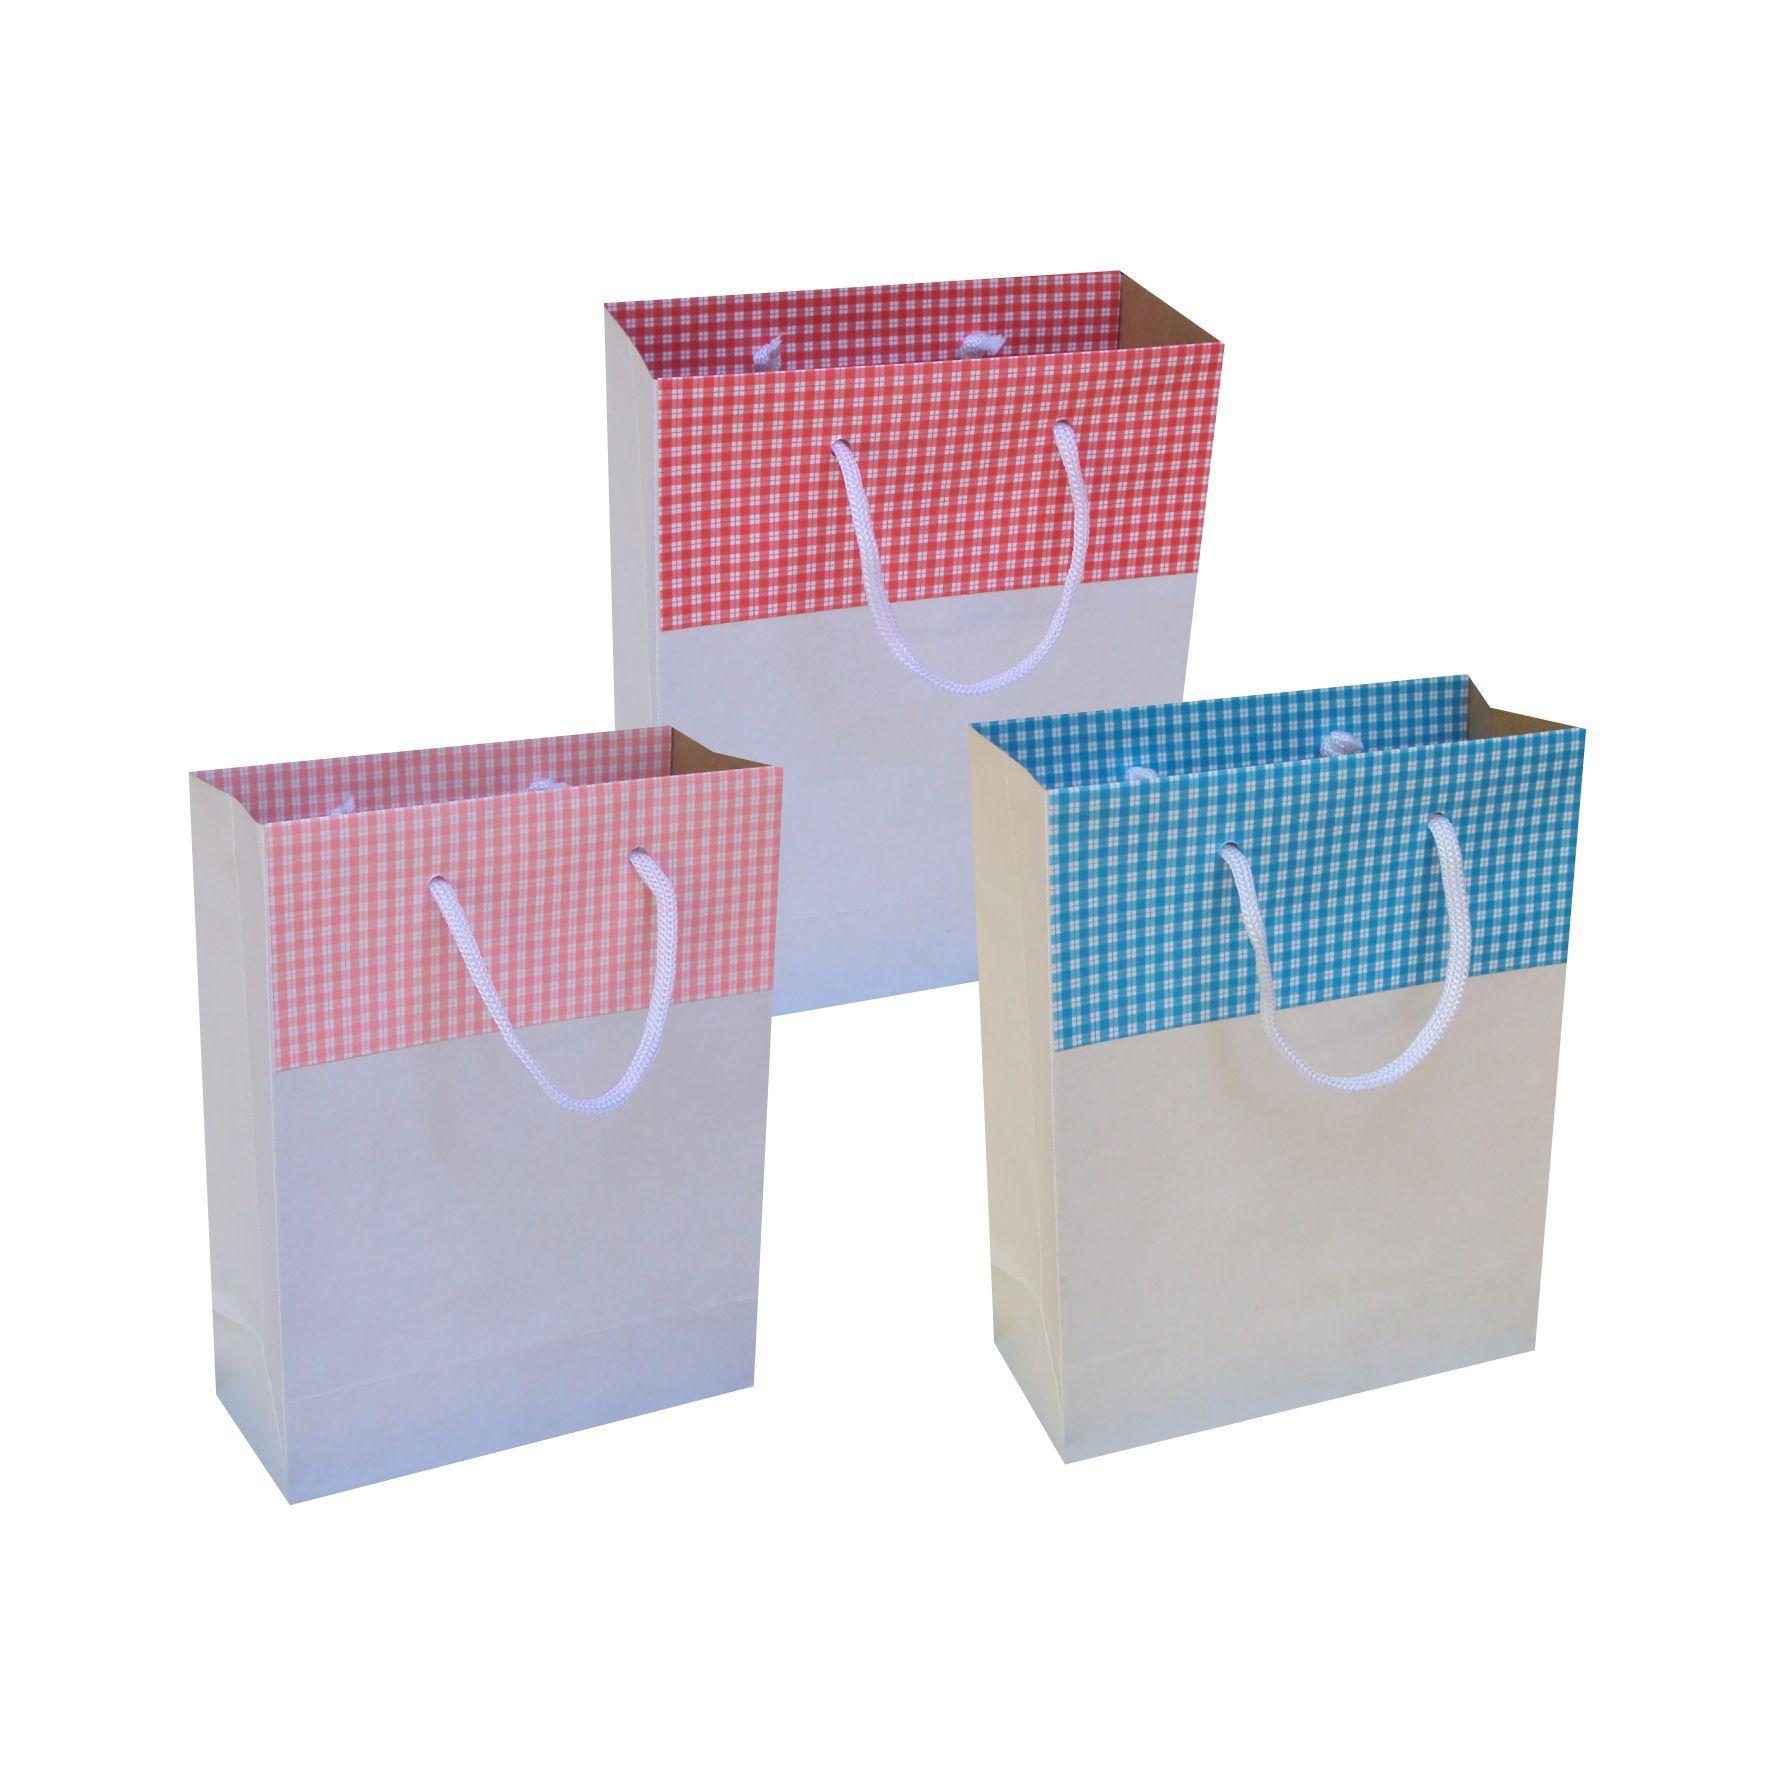 Sacola de papel kraft - cor branca tamanho  -15x19x6,5 cm - 10 unidades